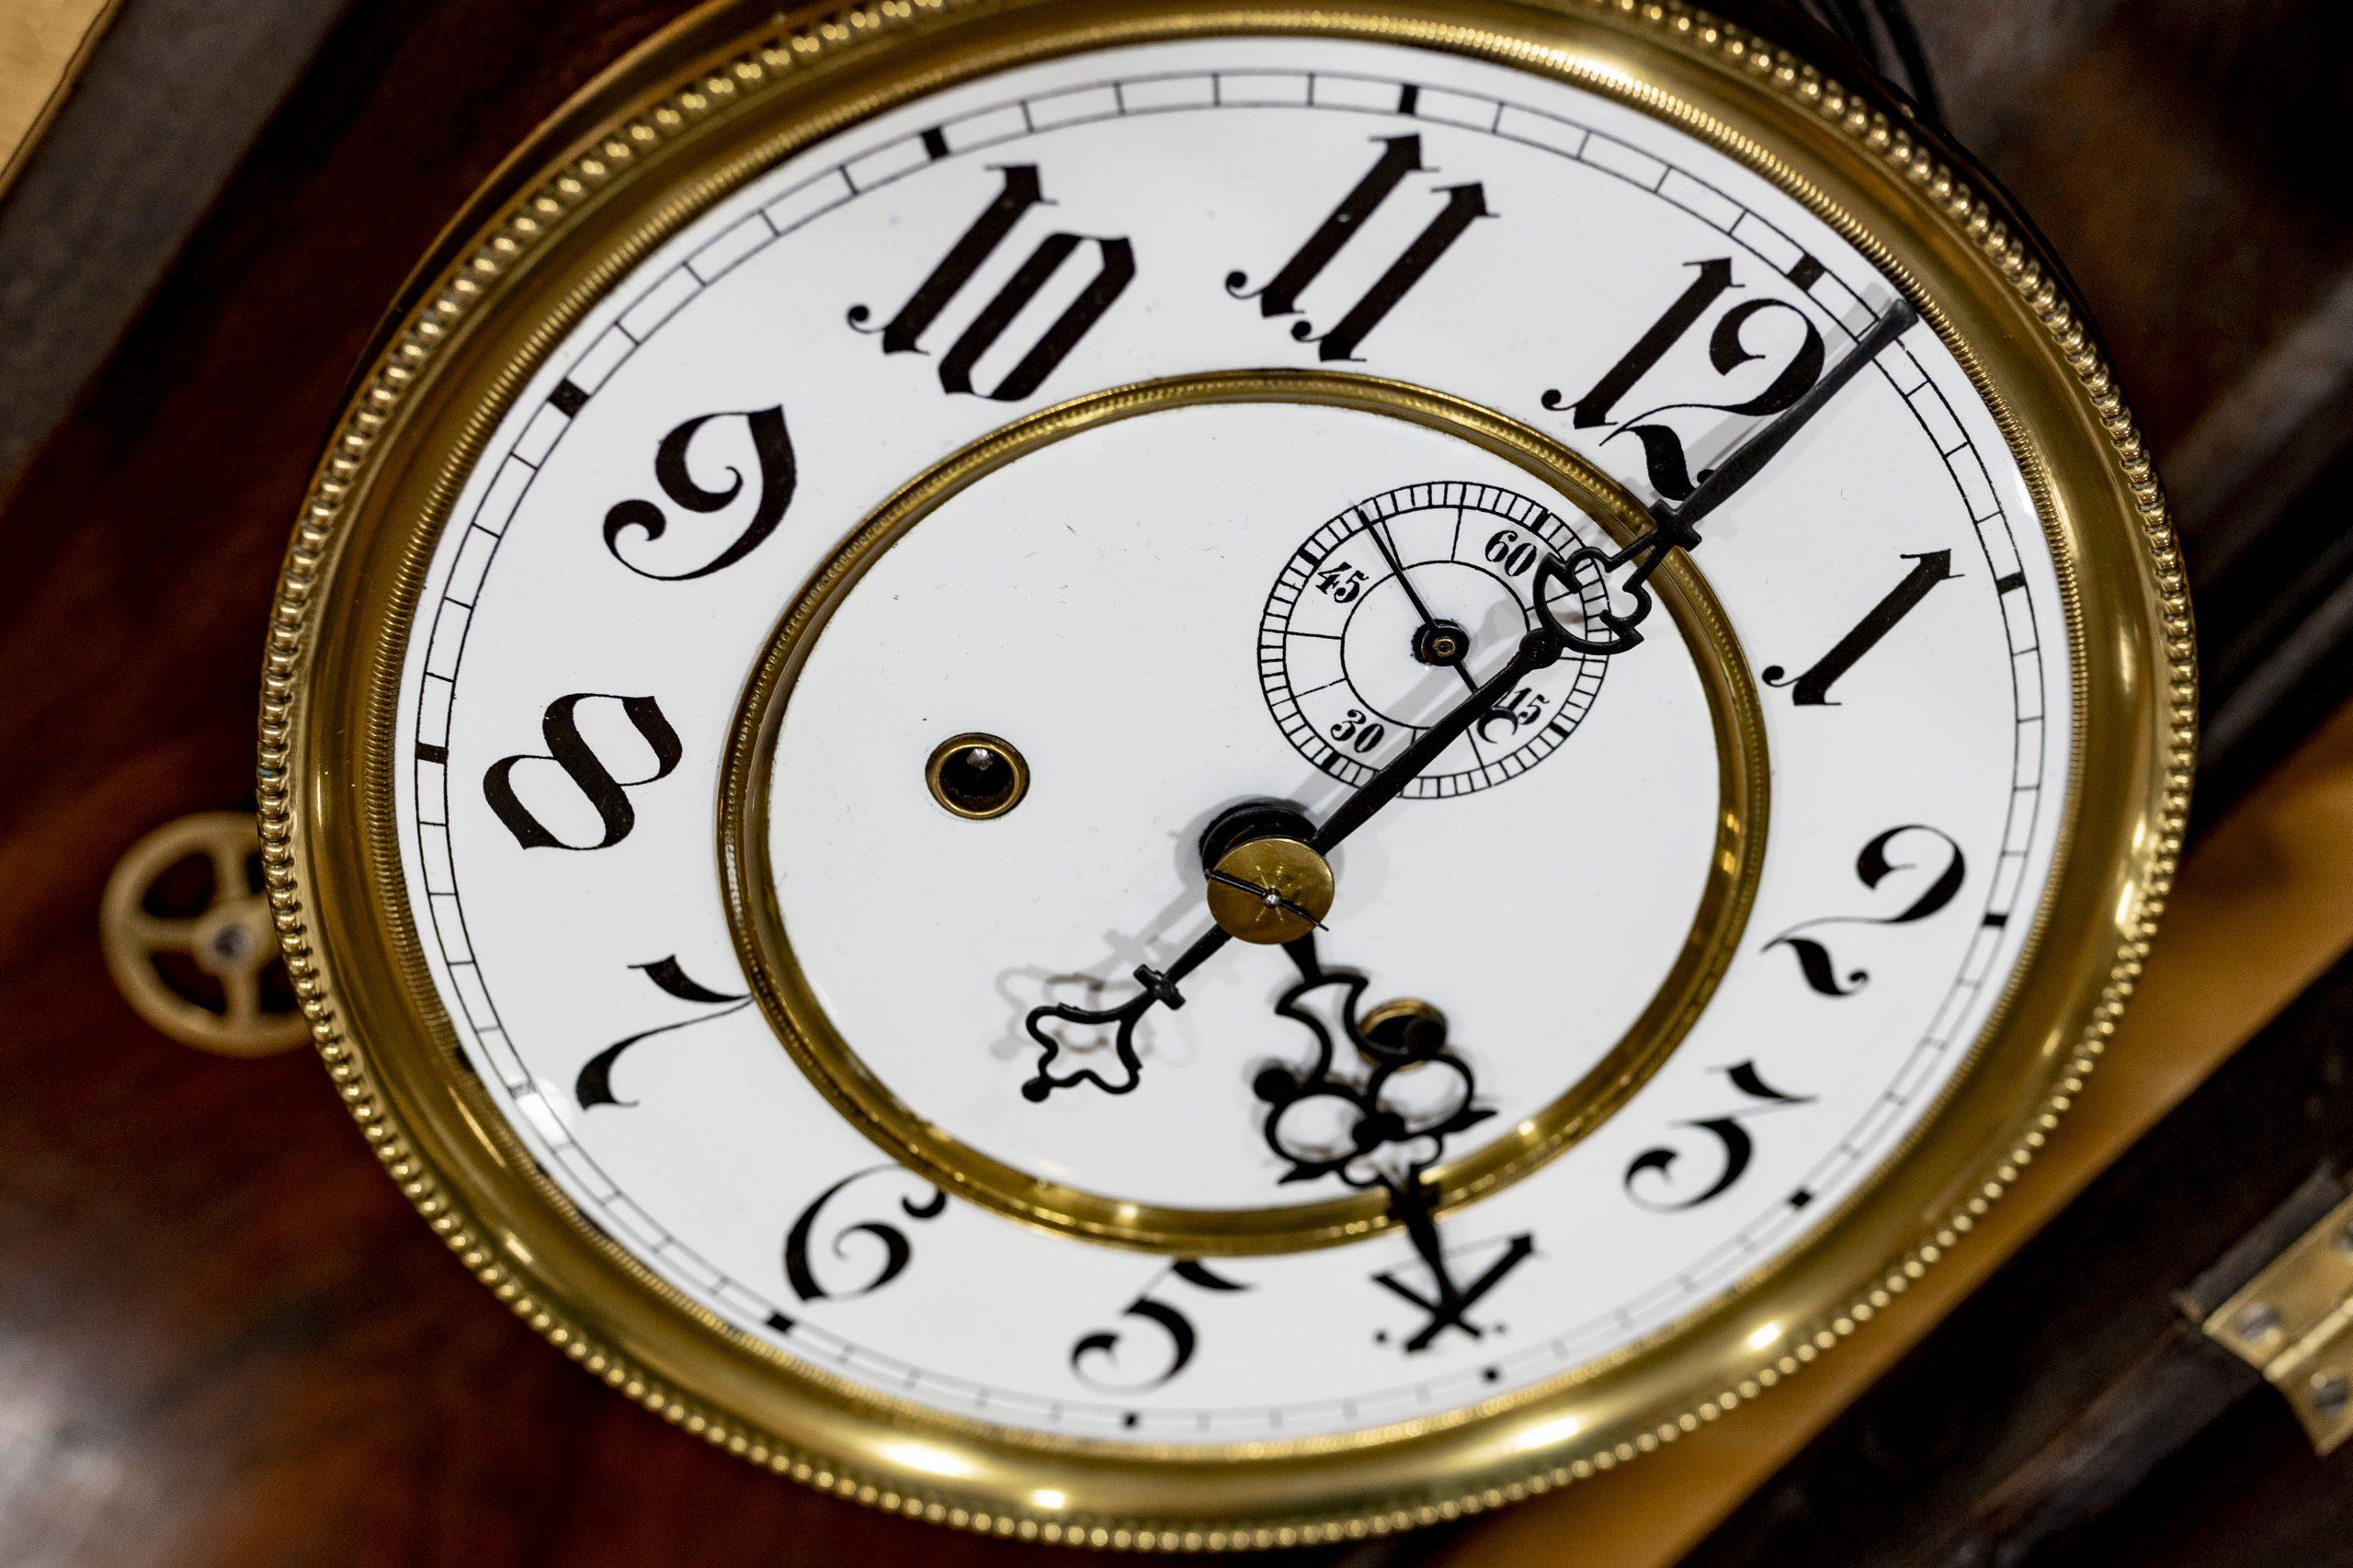 Vintage Clocks - Emma Lowe Commercial Photography